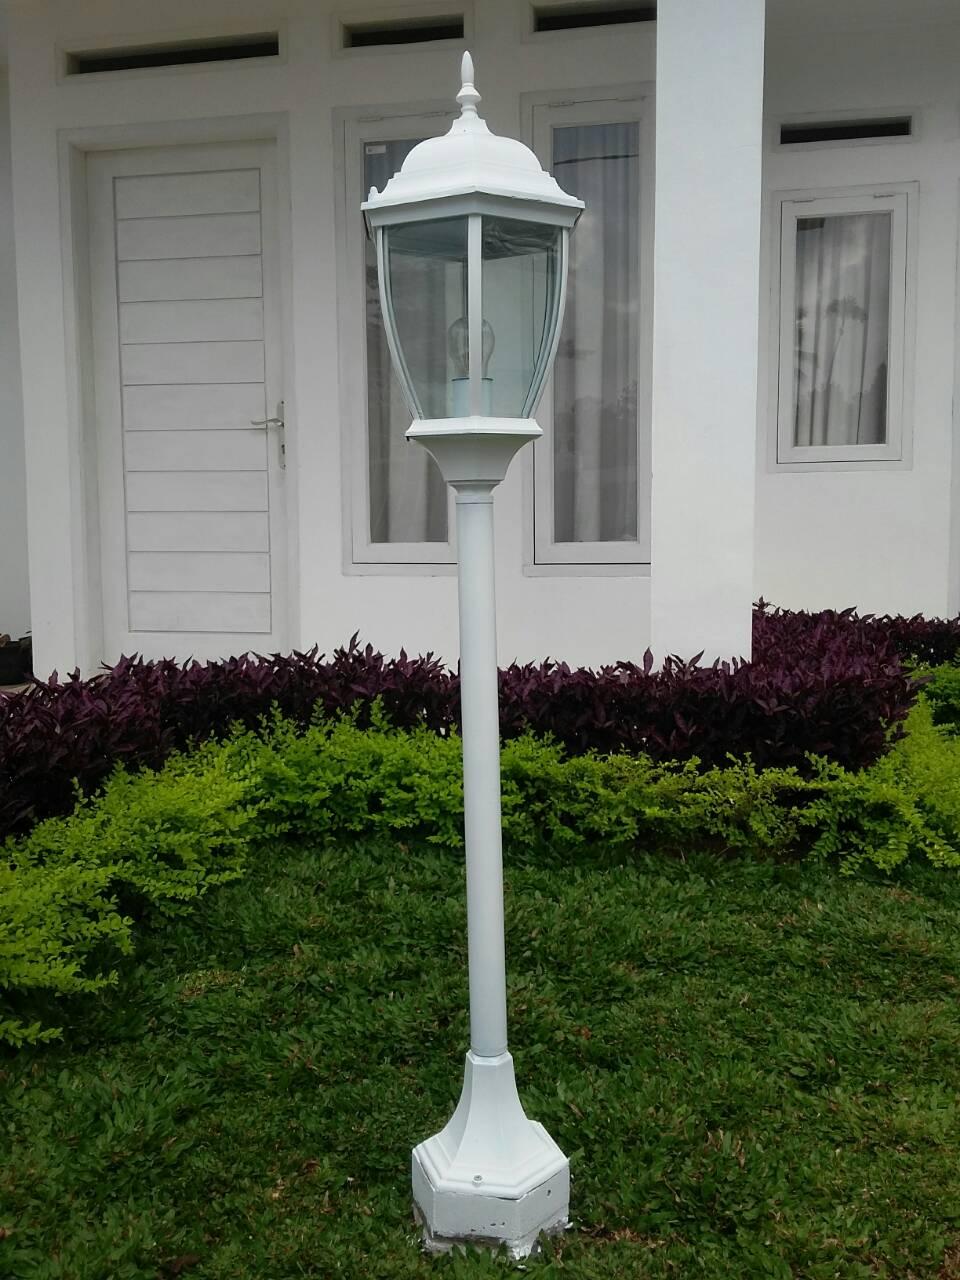 Cat Rumah Shabby - jual lampu taman garden lamp light shab chic vintage belum di 316630 3c5e30bc ff31 4bac 9d6b a2f75e3d311a